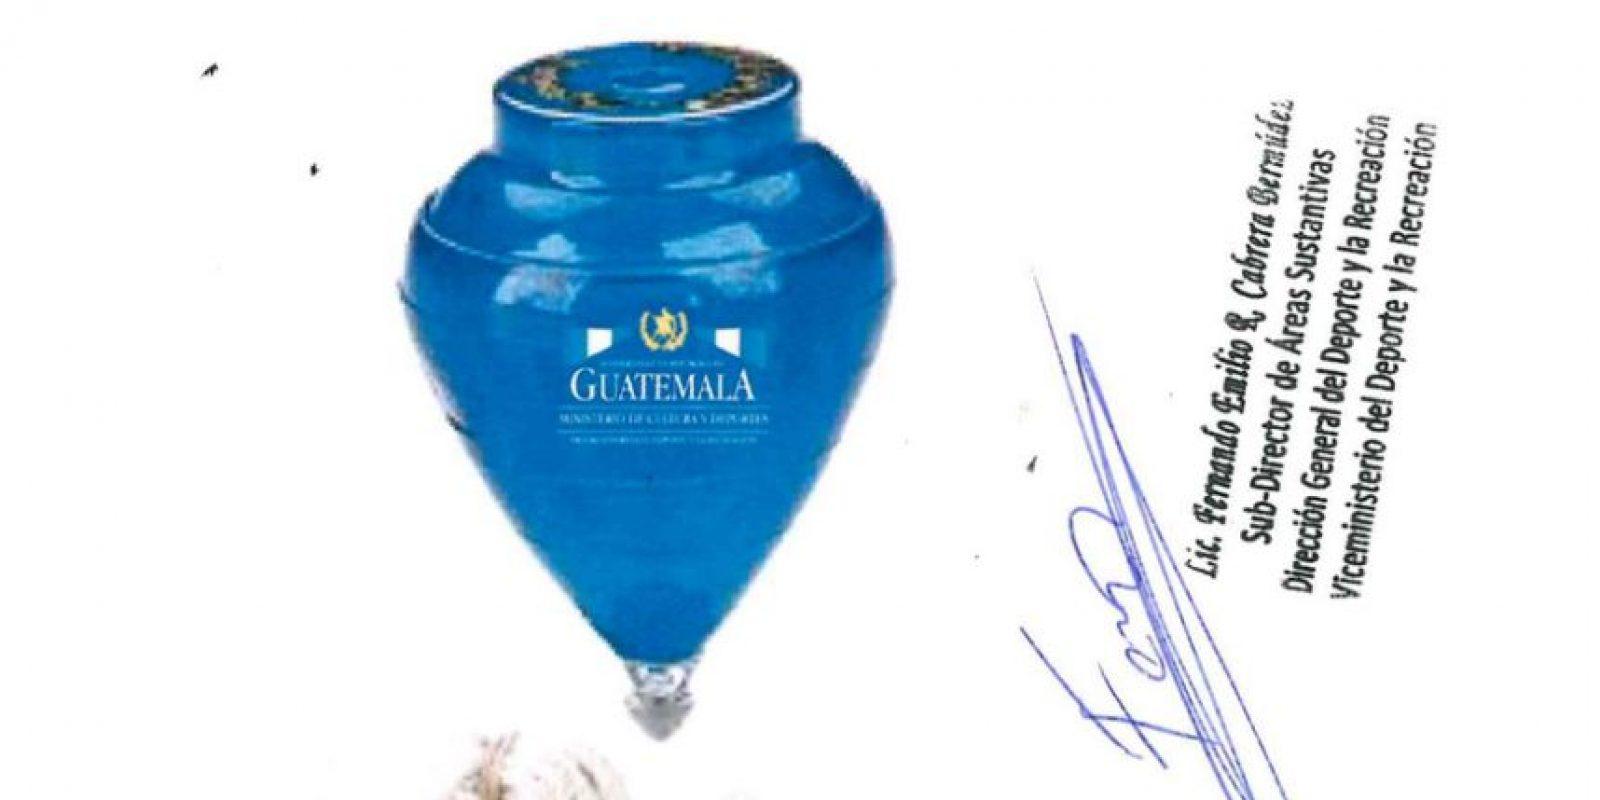 Muestra del producto Foto:Guatecompras